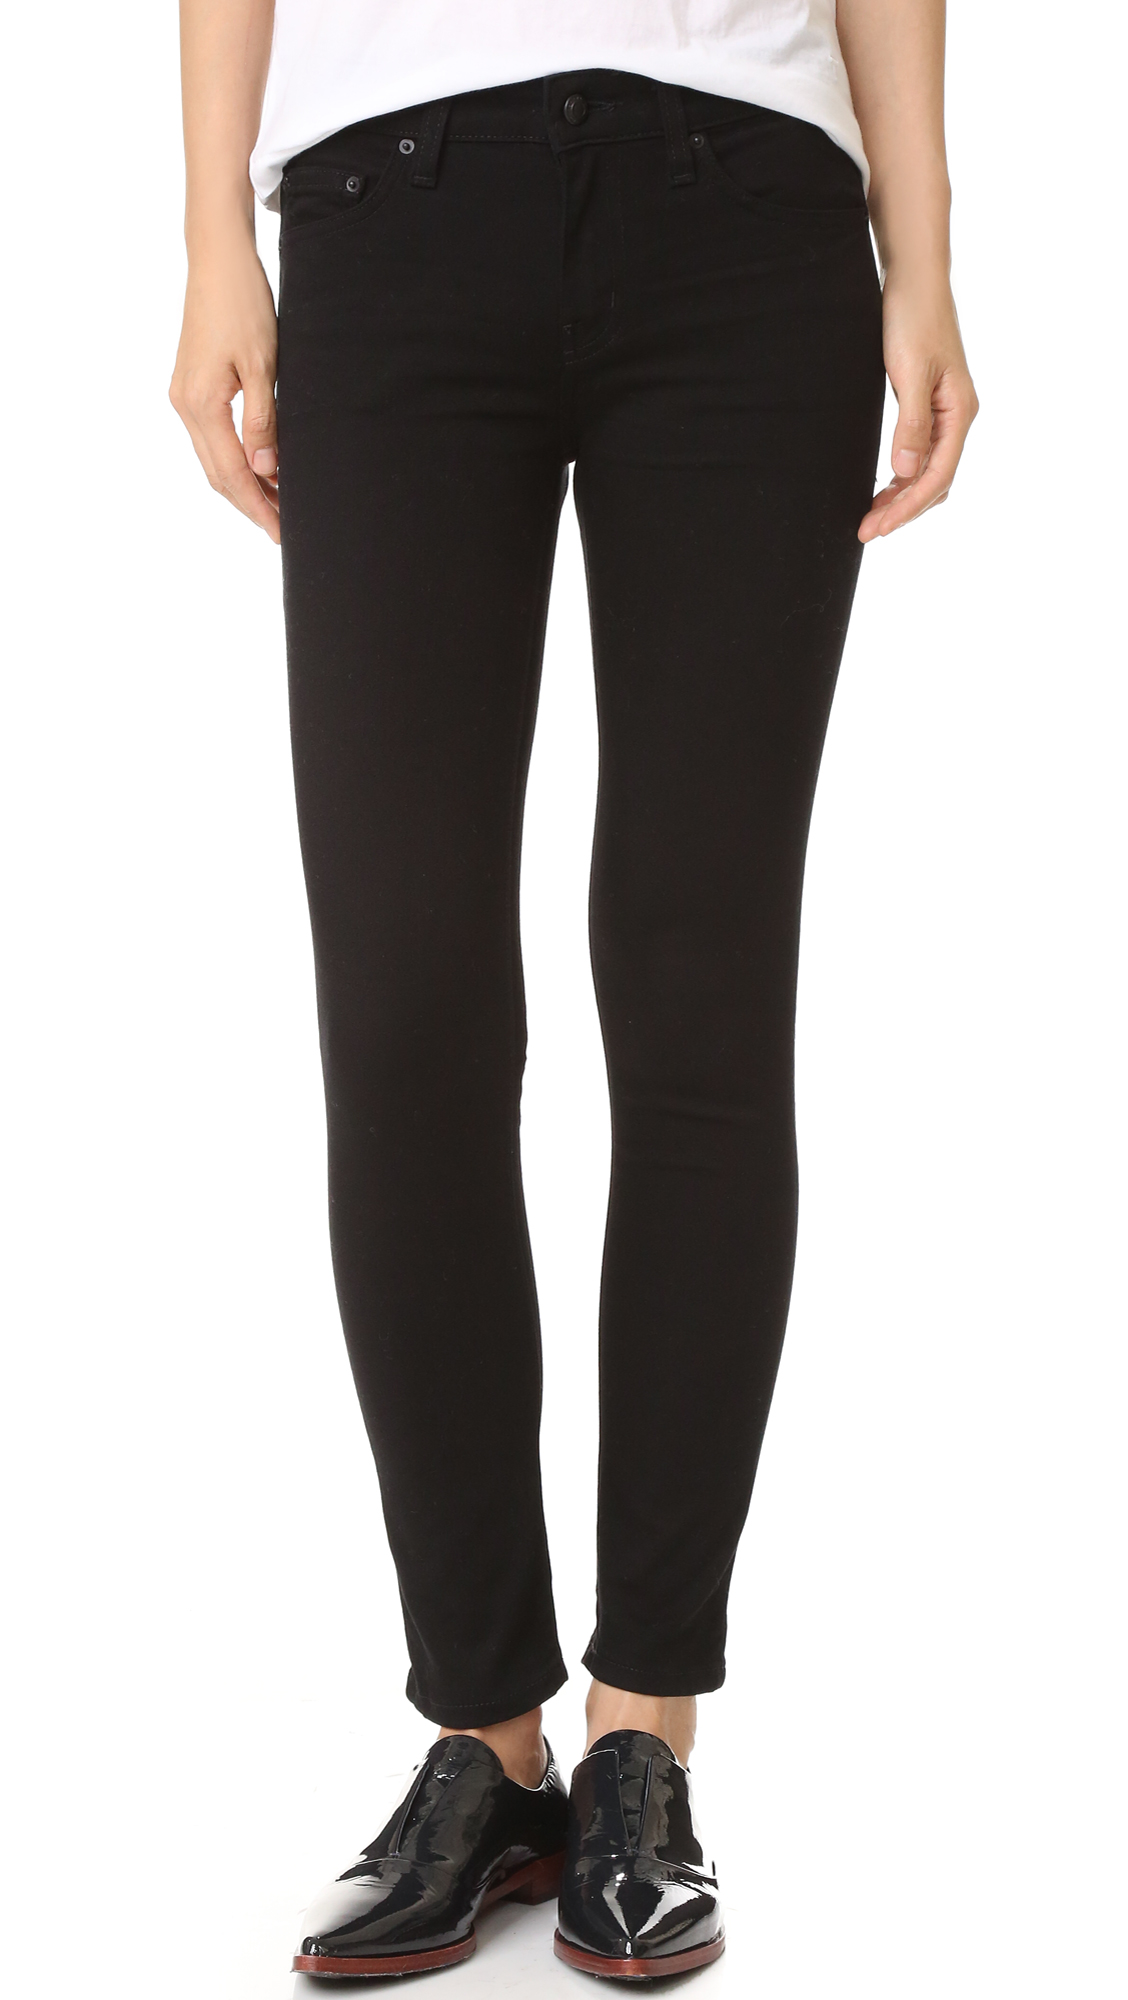 Derek Lam 10 Crosby Devi Midrise Skinny Jeans - Black at Shopbop